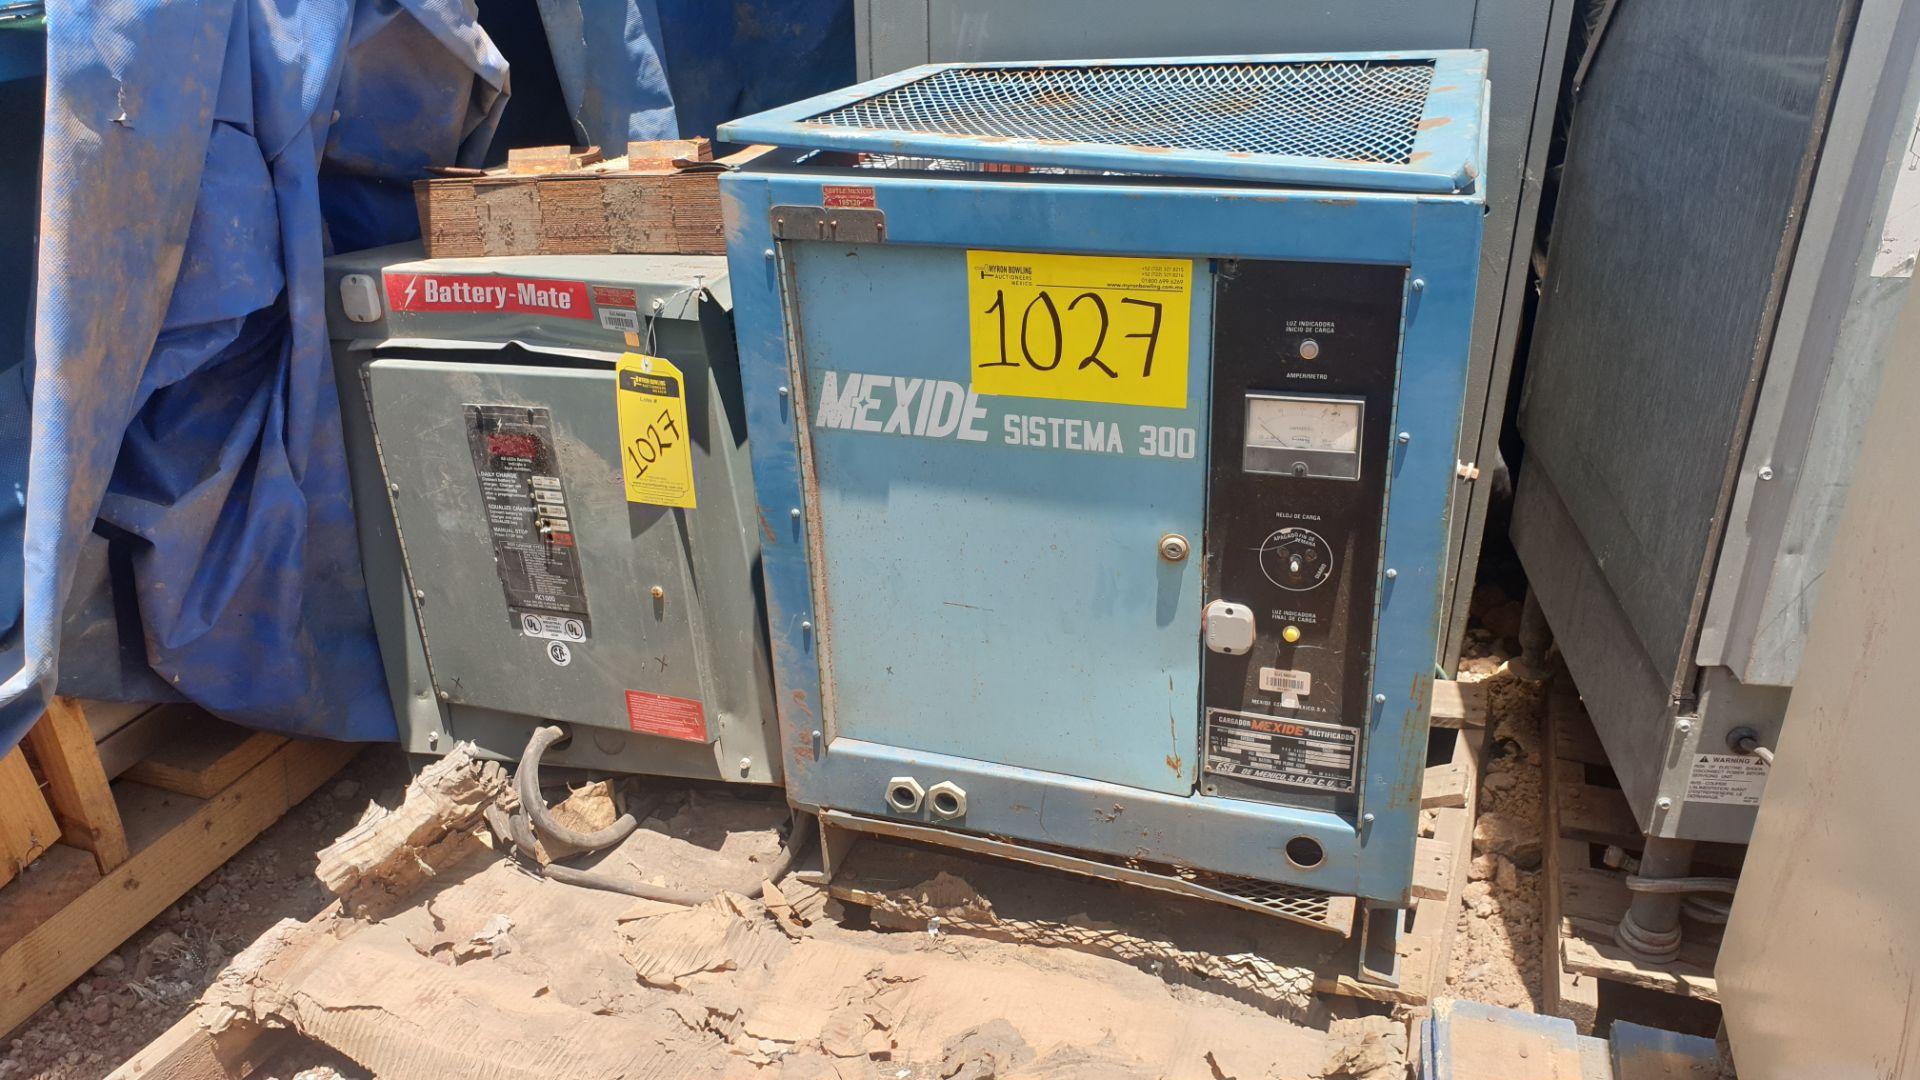 1 Battery-Mate charger, model 1050H3-18C 208/240/480V, 1 Mexide charger model CAS18.3.700 - Image 3 of 9